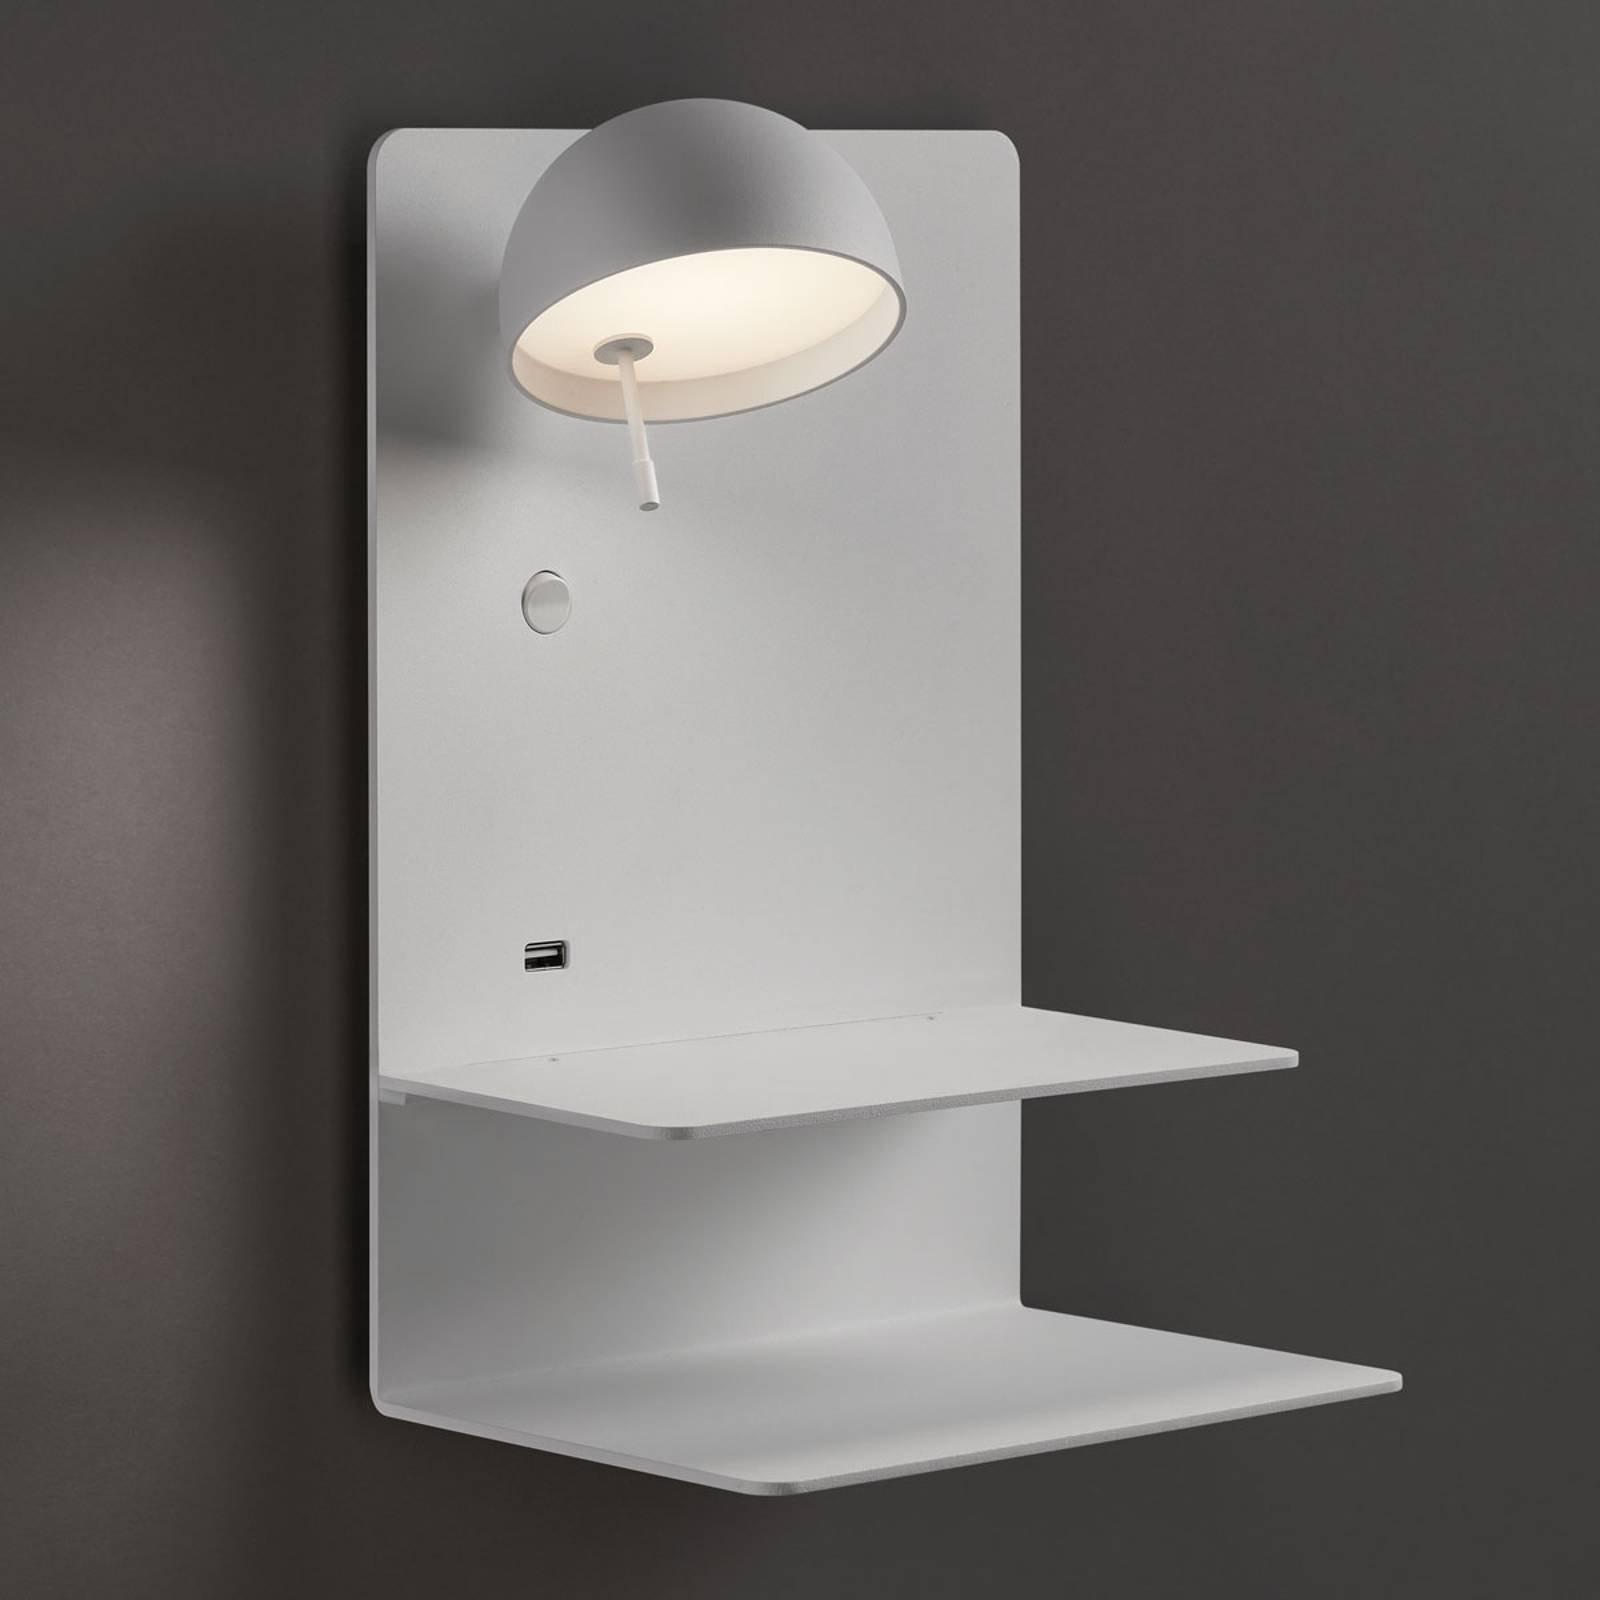 Bover Beddy A/04 LED-vegglampe hvit spot venstre